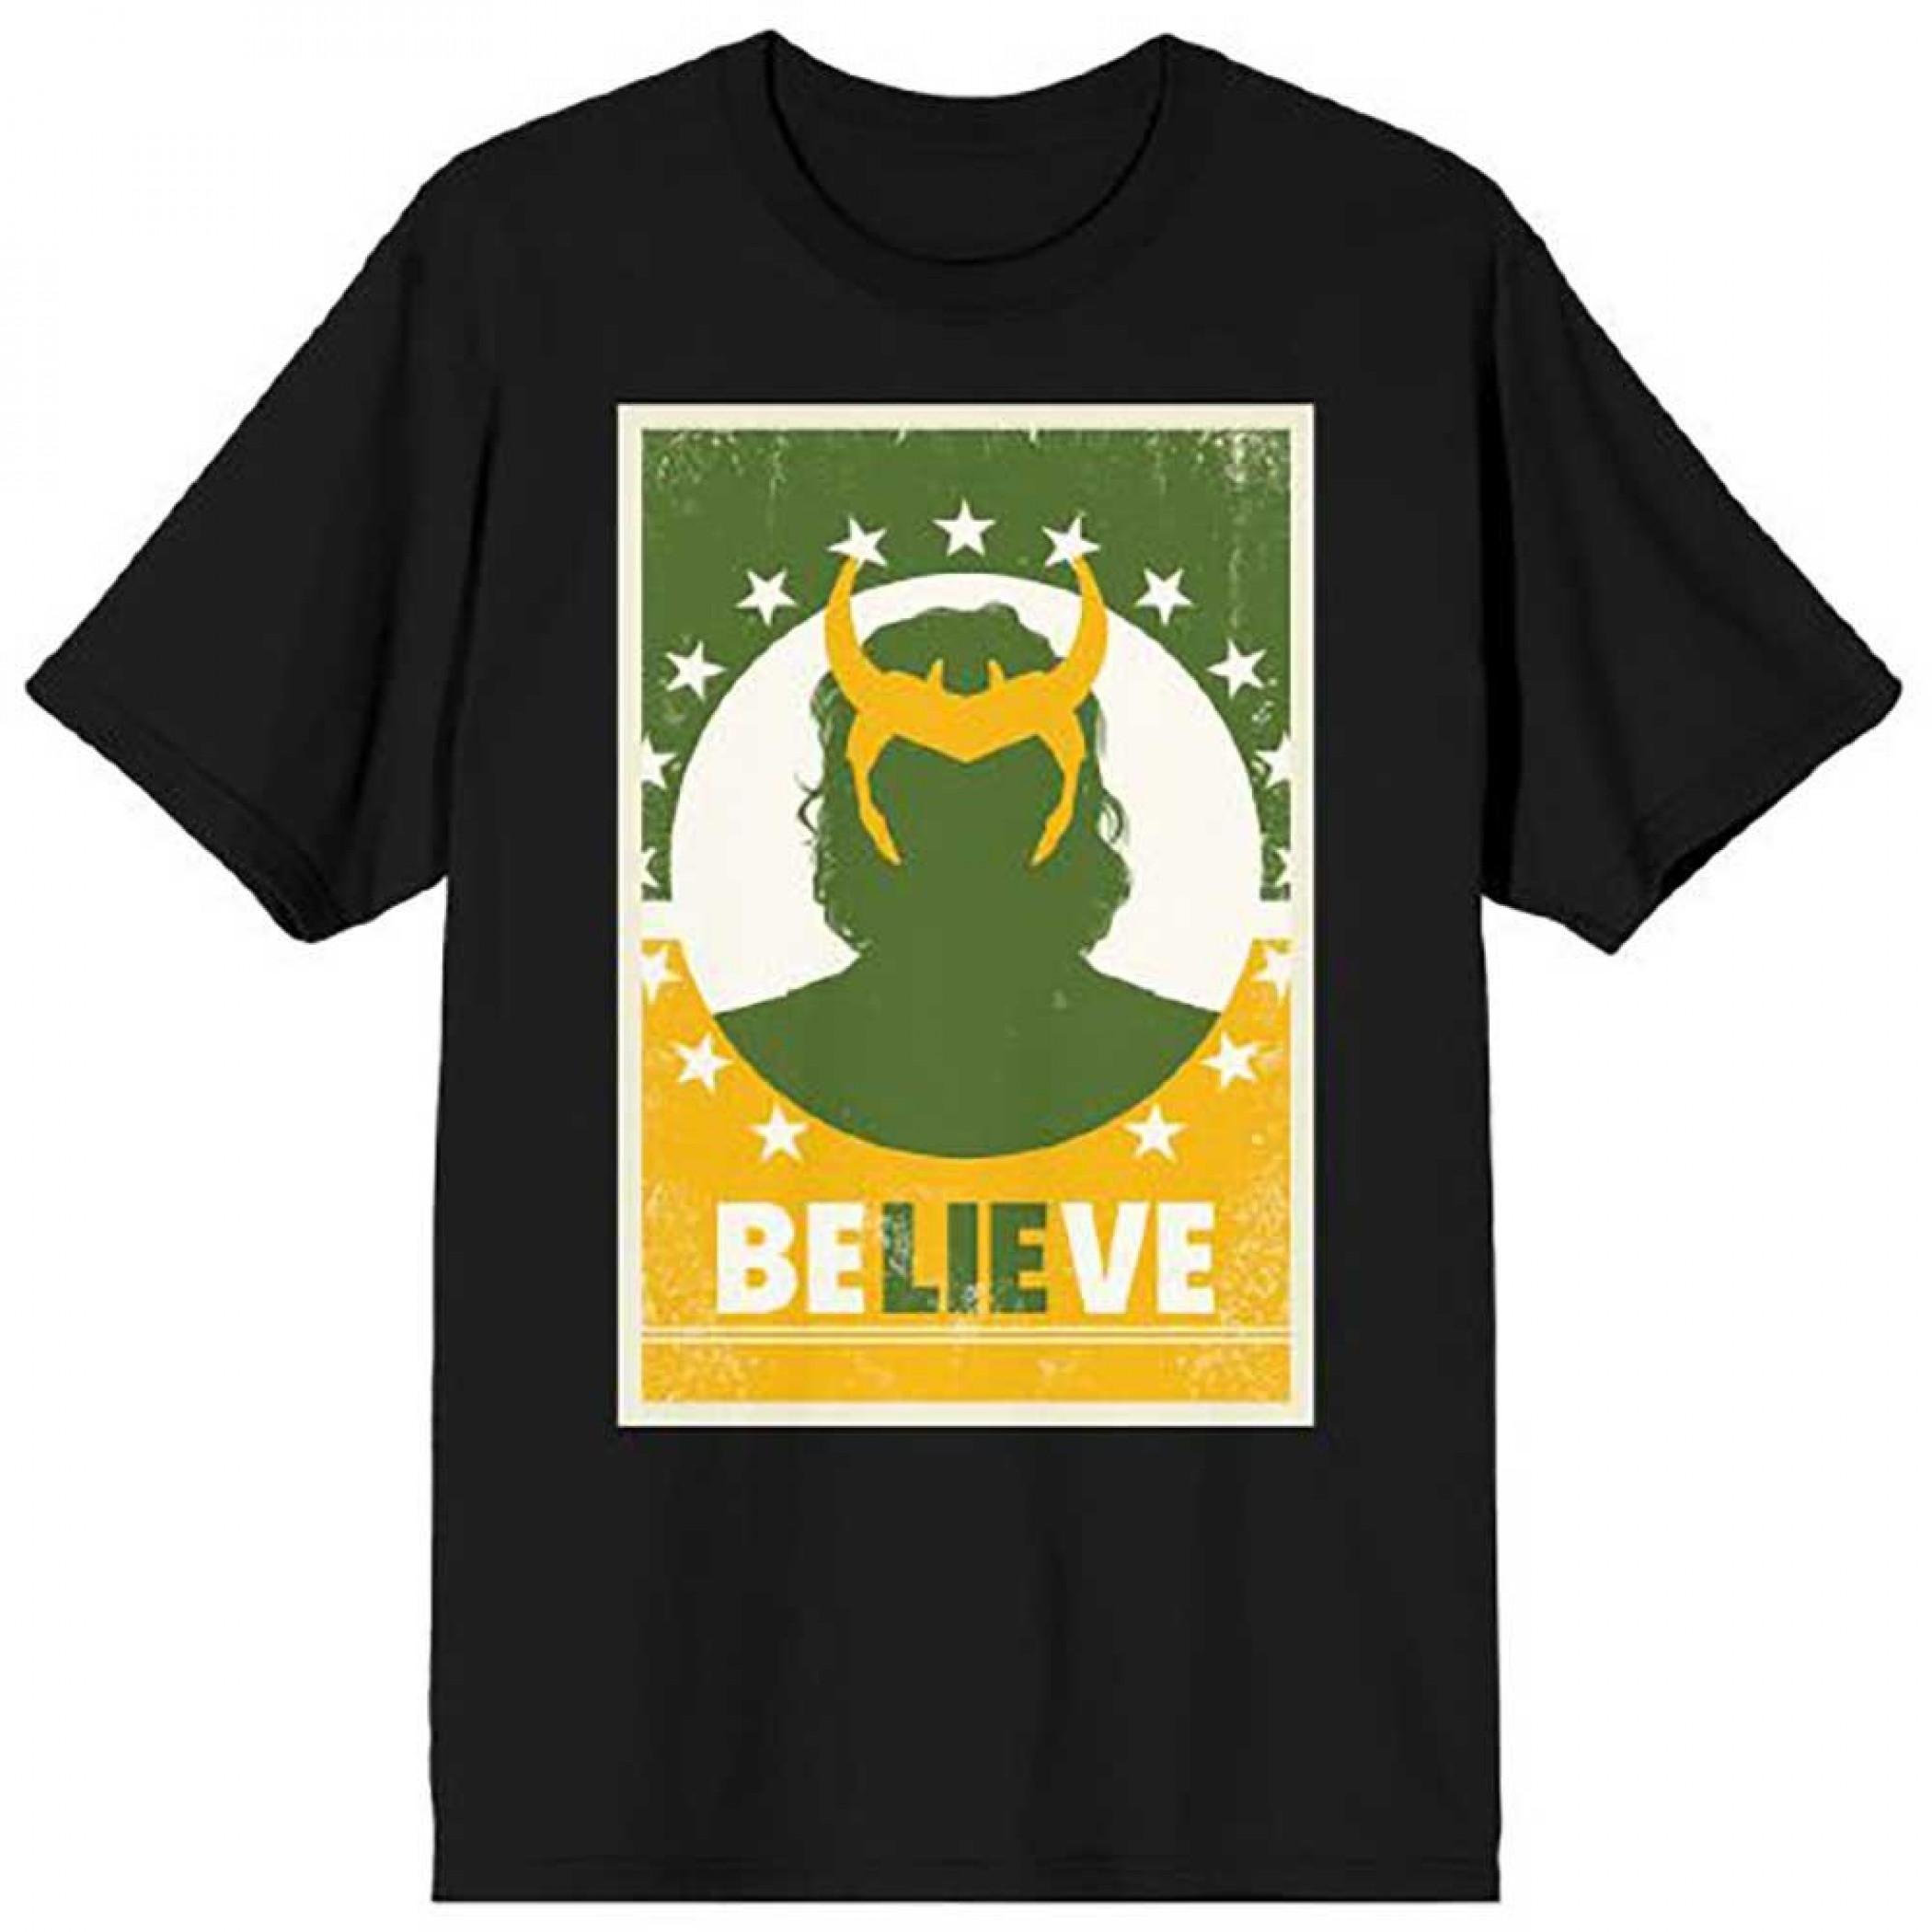 "Marvel Studios Loki Series Believe ""LIE"" T-Shirt"